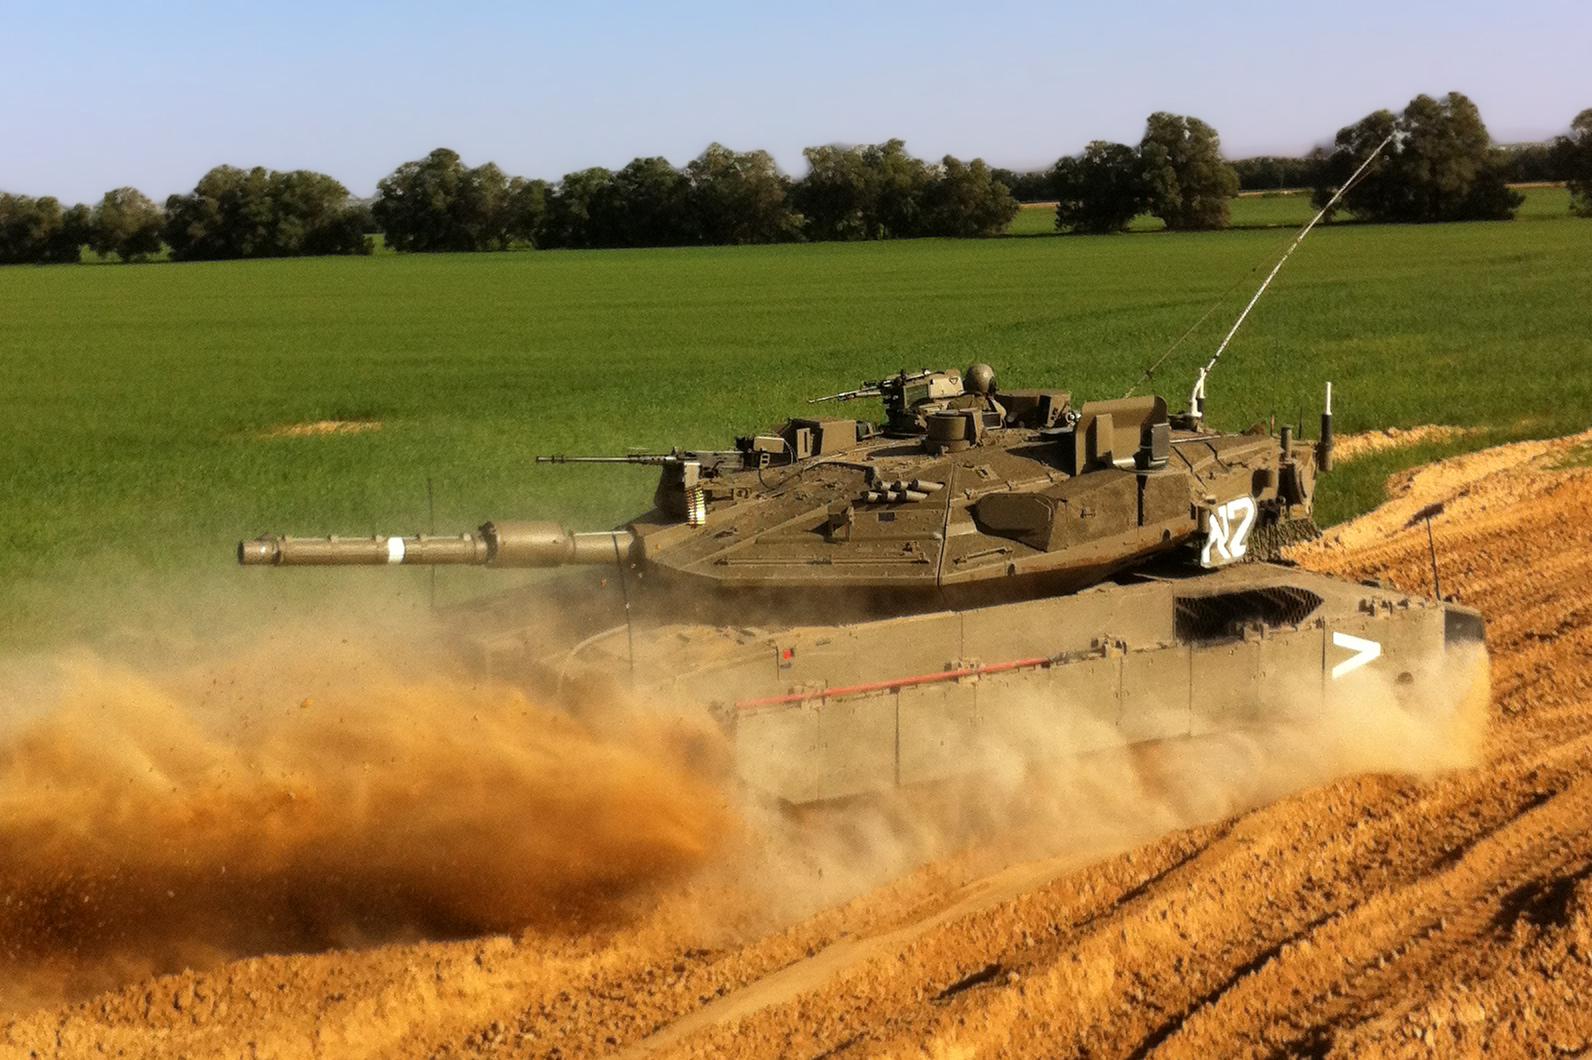 I Waged a Massive Israel vs. Syria Tank War Simulation